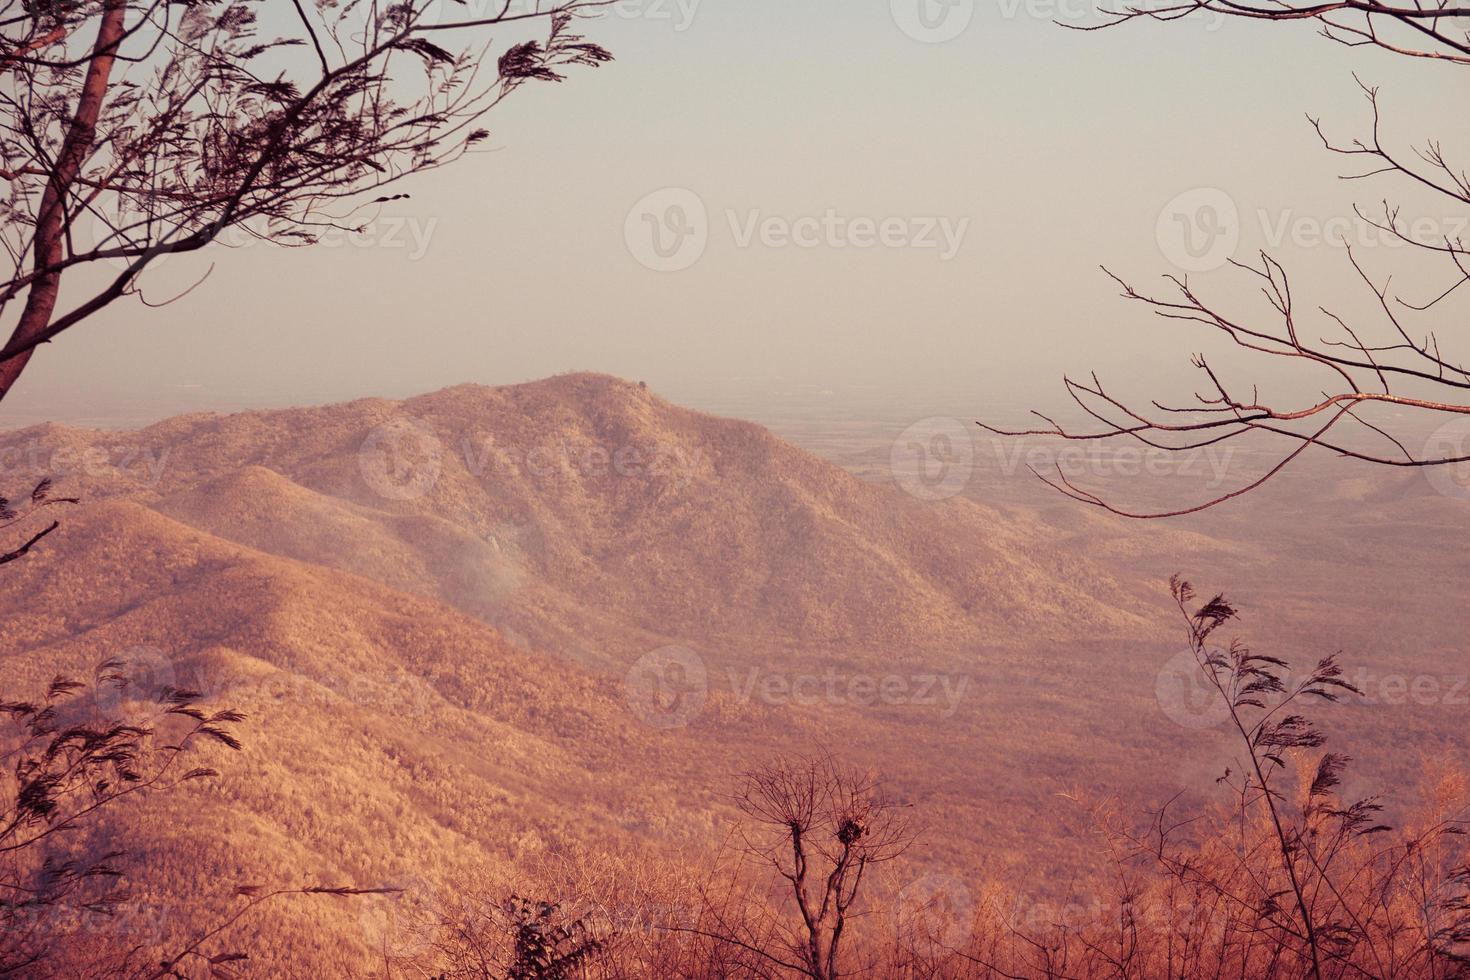 The Red Tone Mountain photo